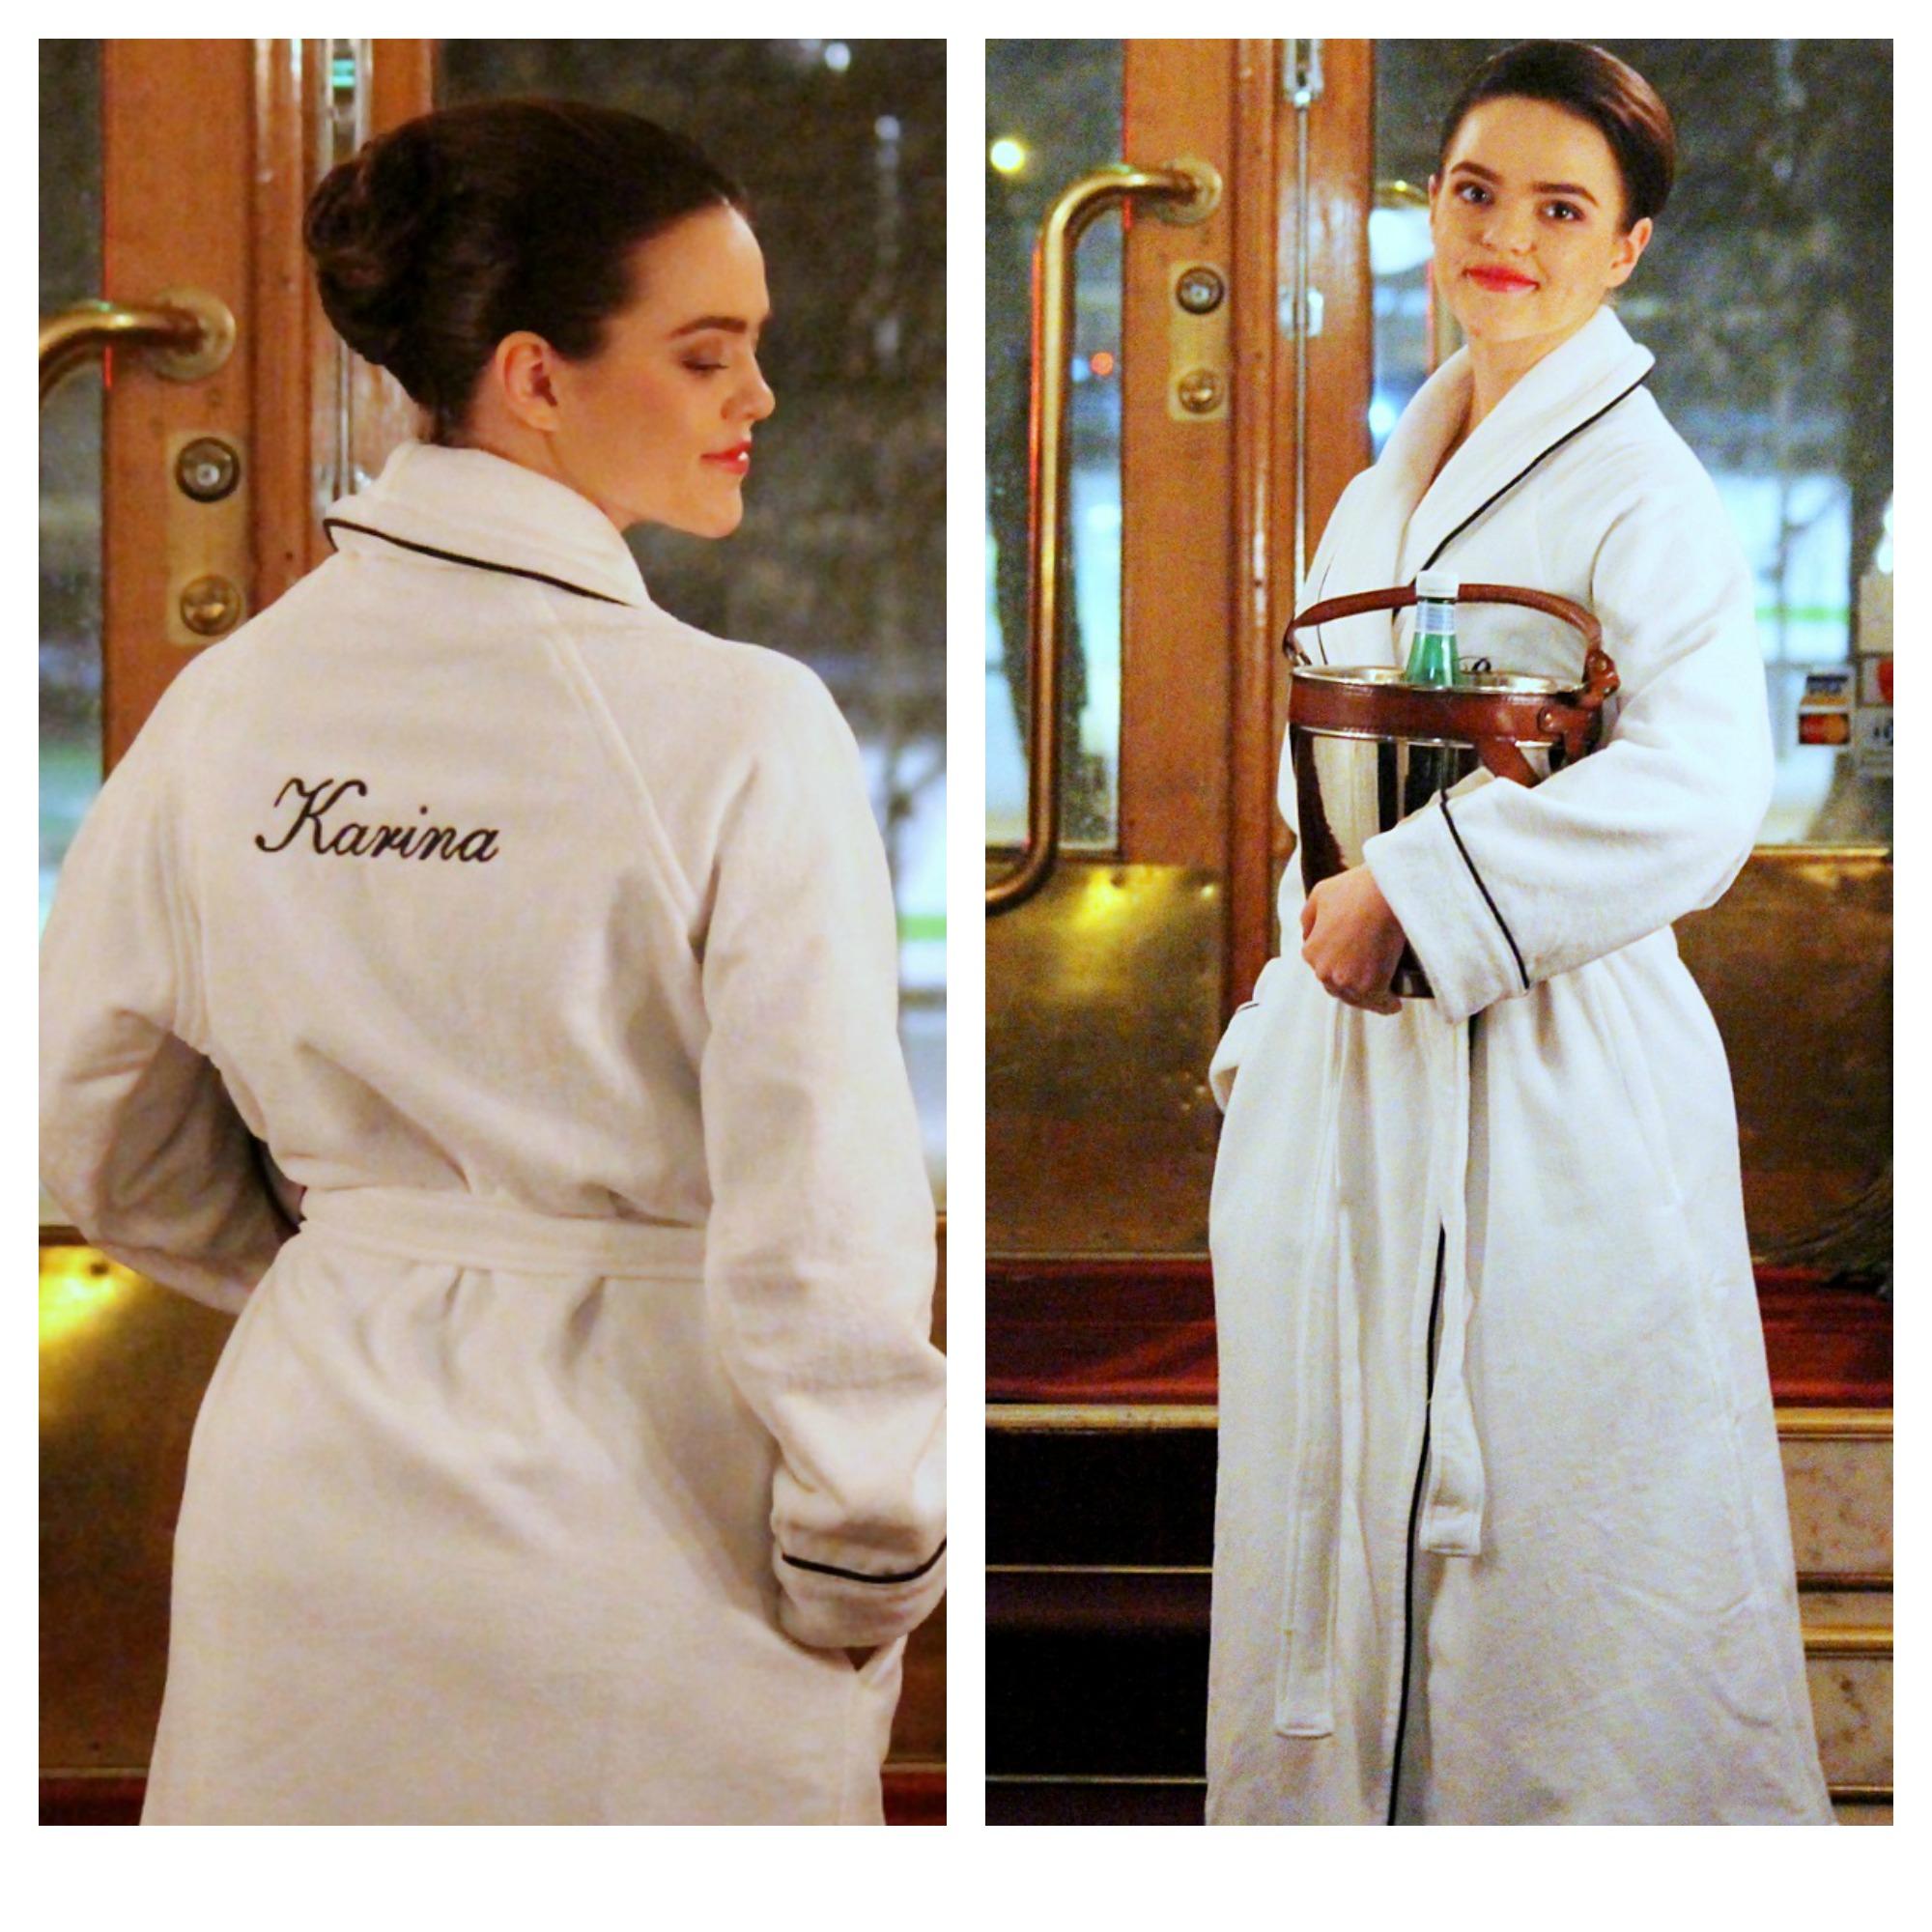 Balmuir bathrobe with monogram & champagne cooler